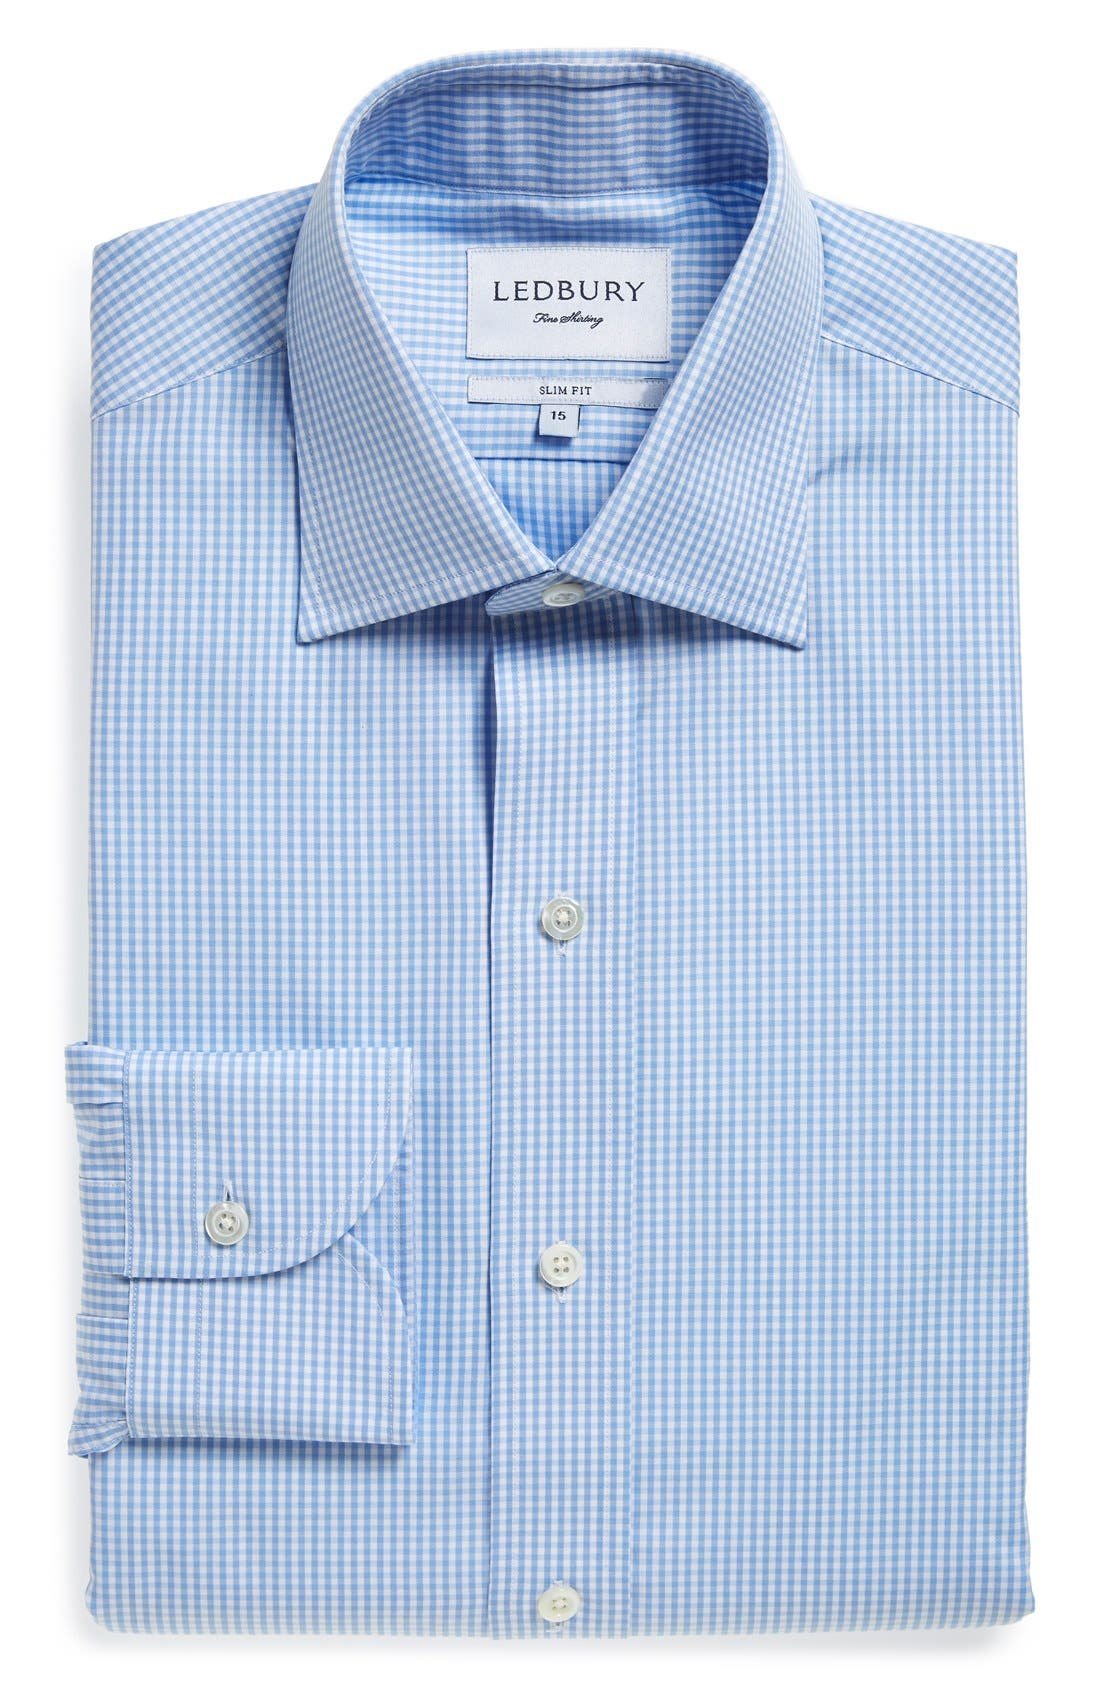 'Blue Gingham' Slim Fit Check Dress Shirt,                         Main,                         color, Blue